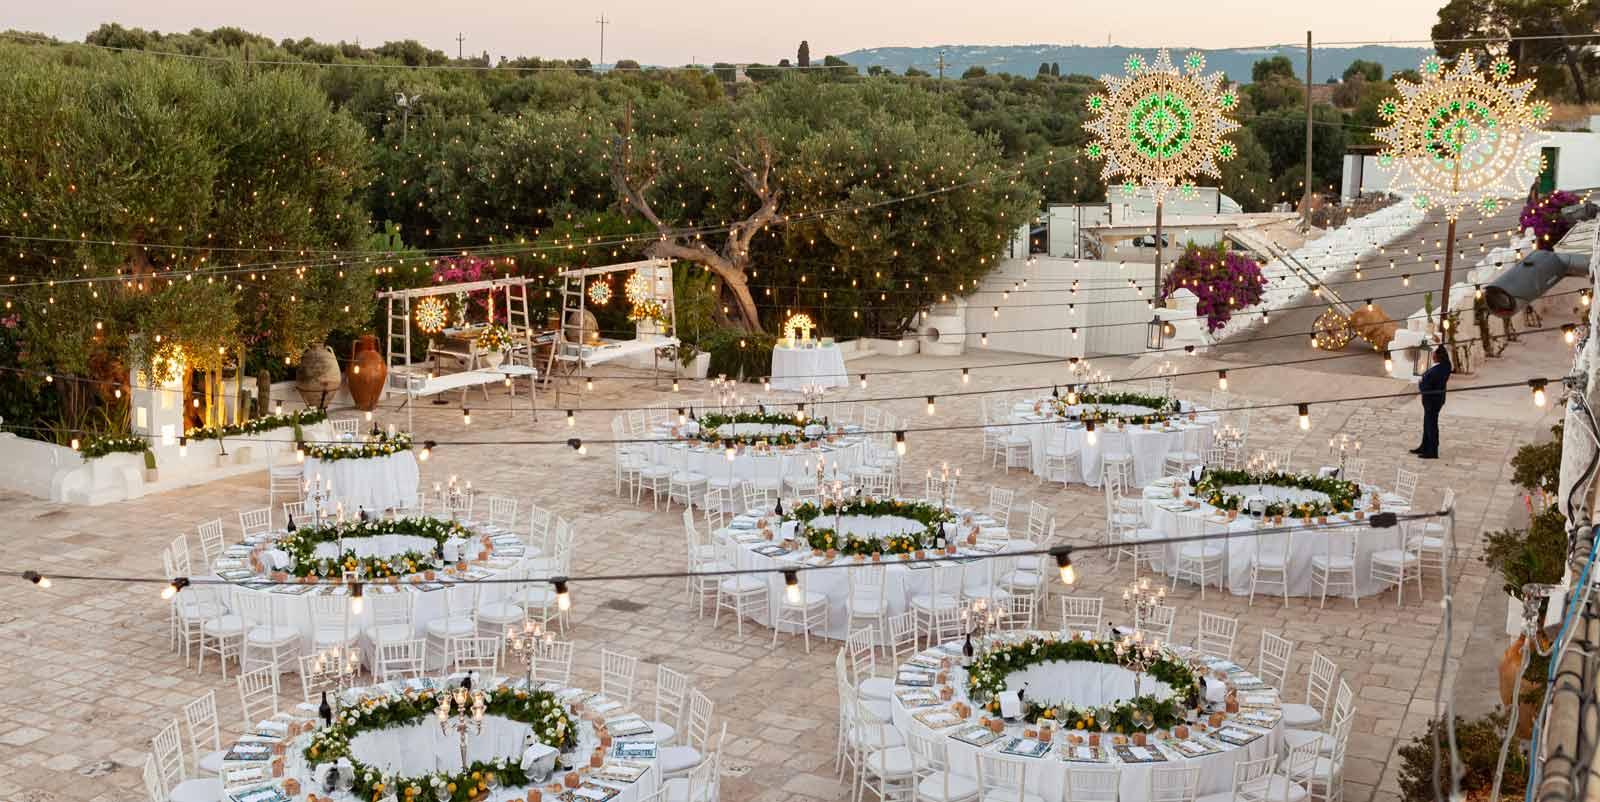 Apulia wedding Italy